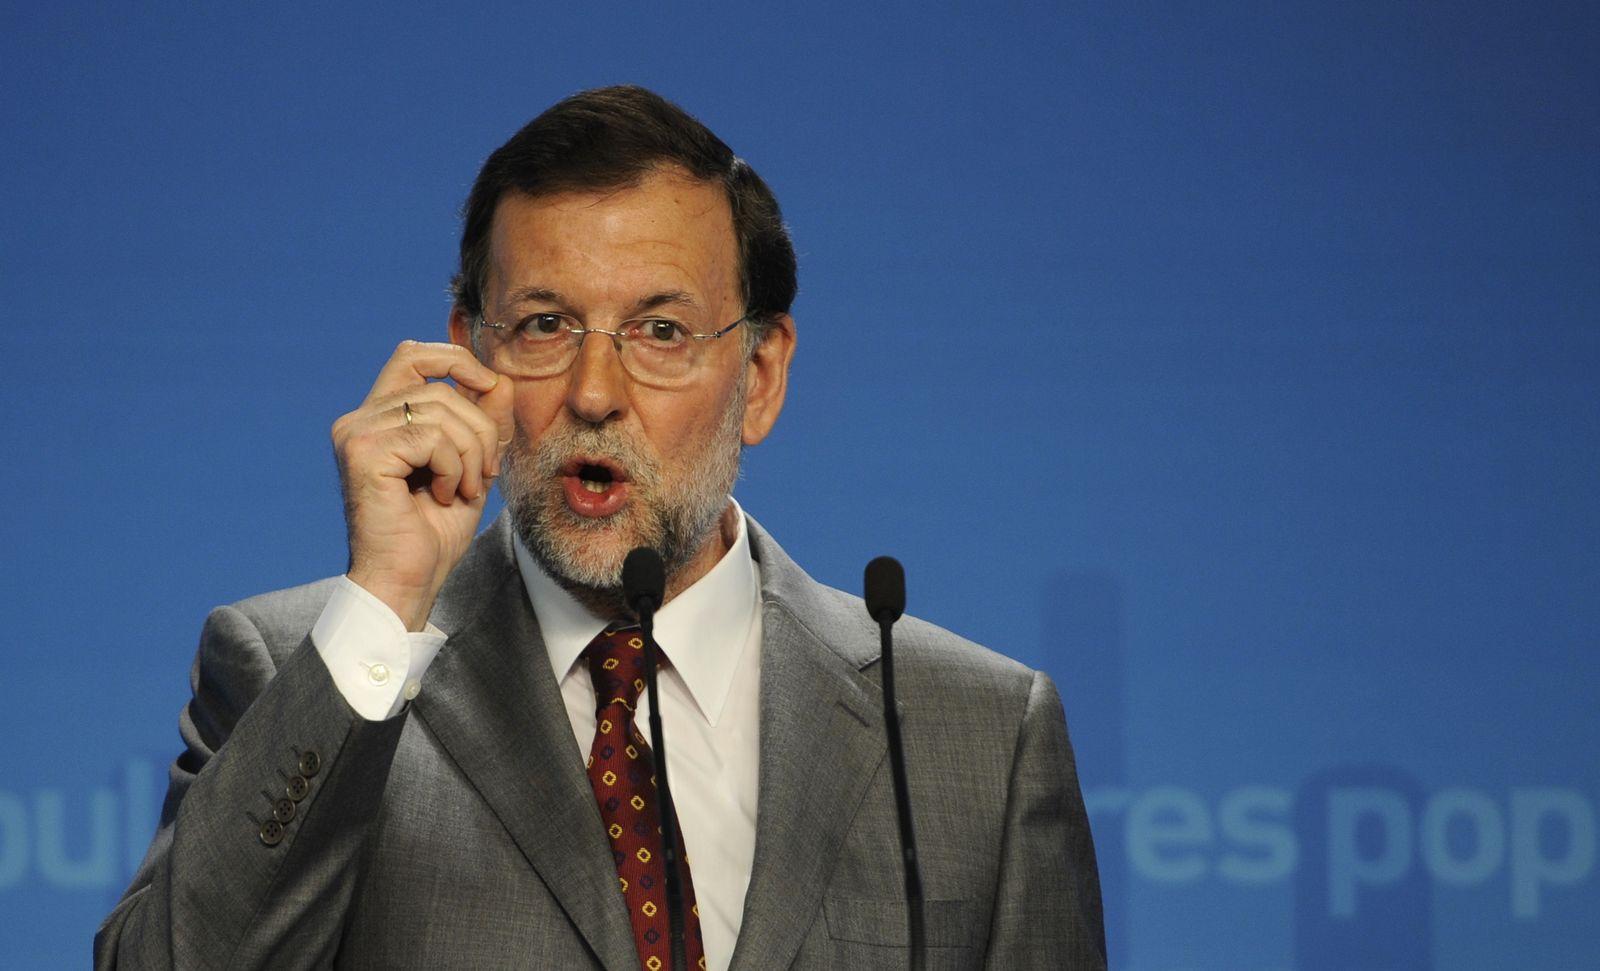 SPAIN-FINANCE-PUBLIC-DEBT-RAJOY-BANKS